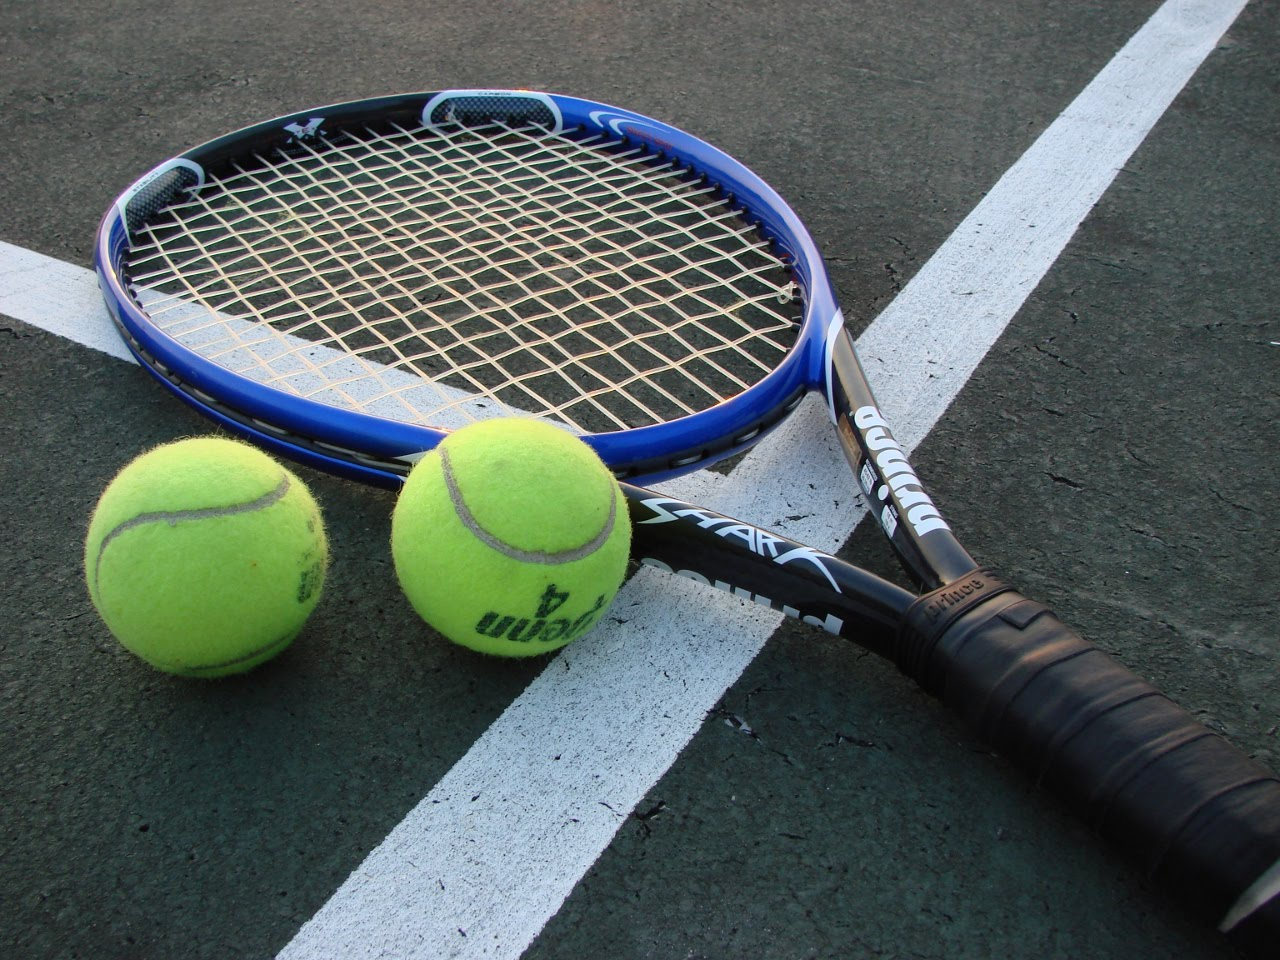 ATP Brisbane De Minaur - Harrison